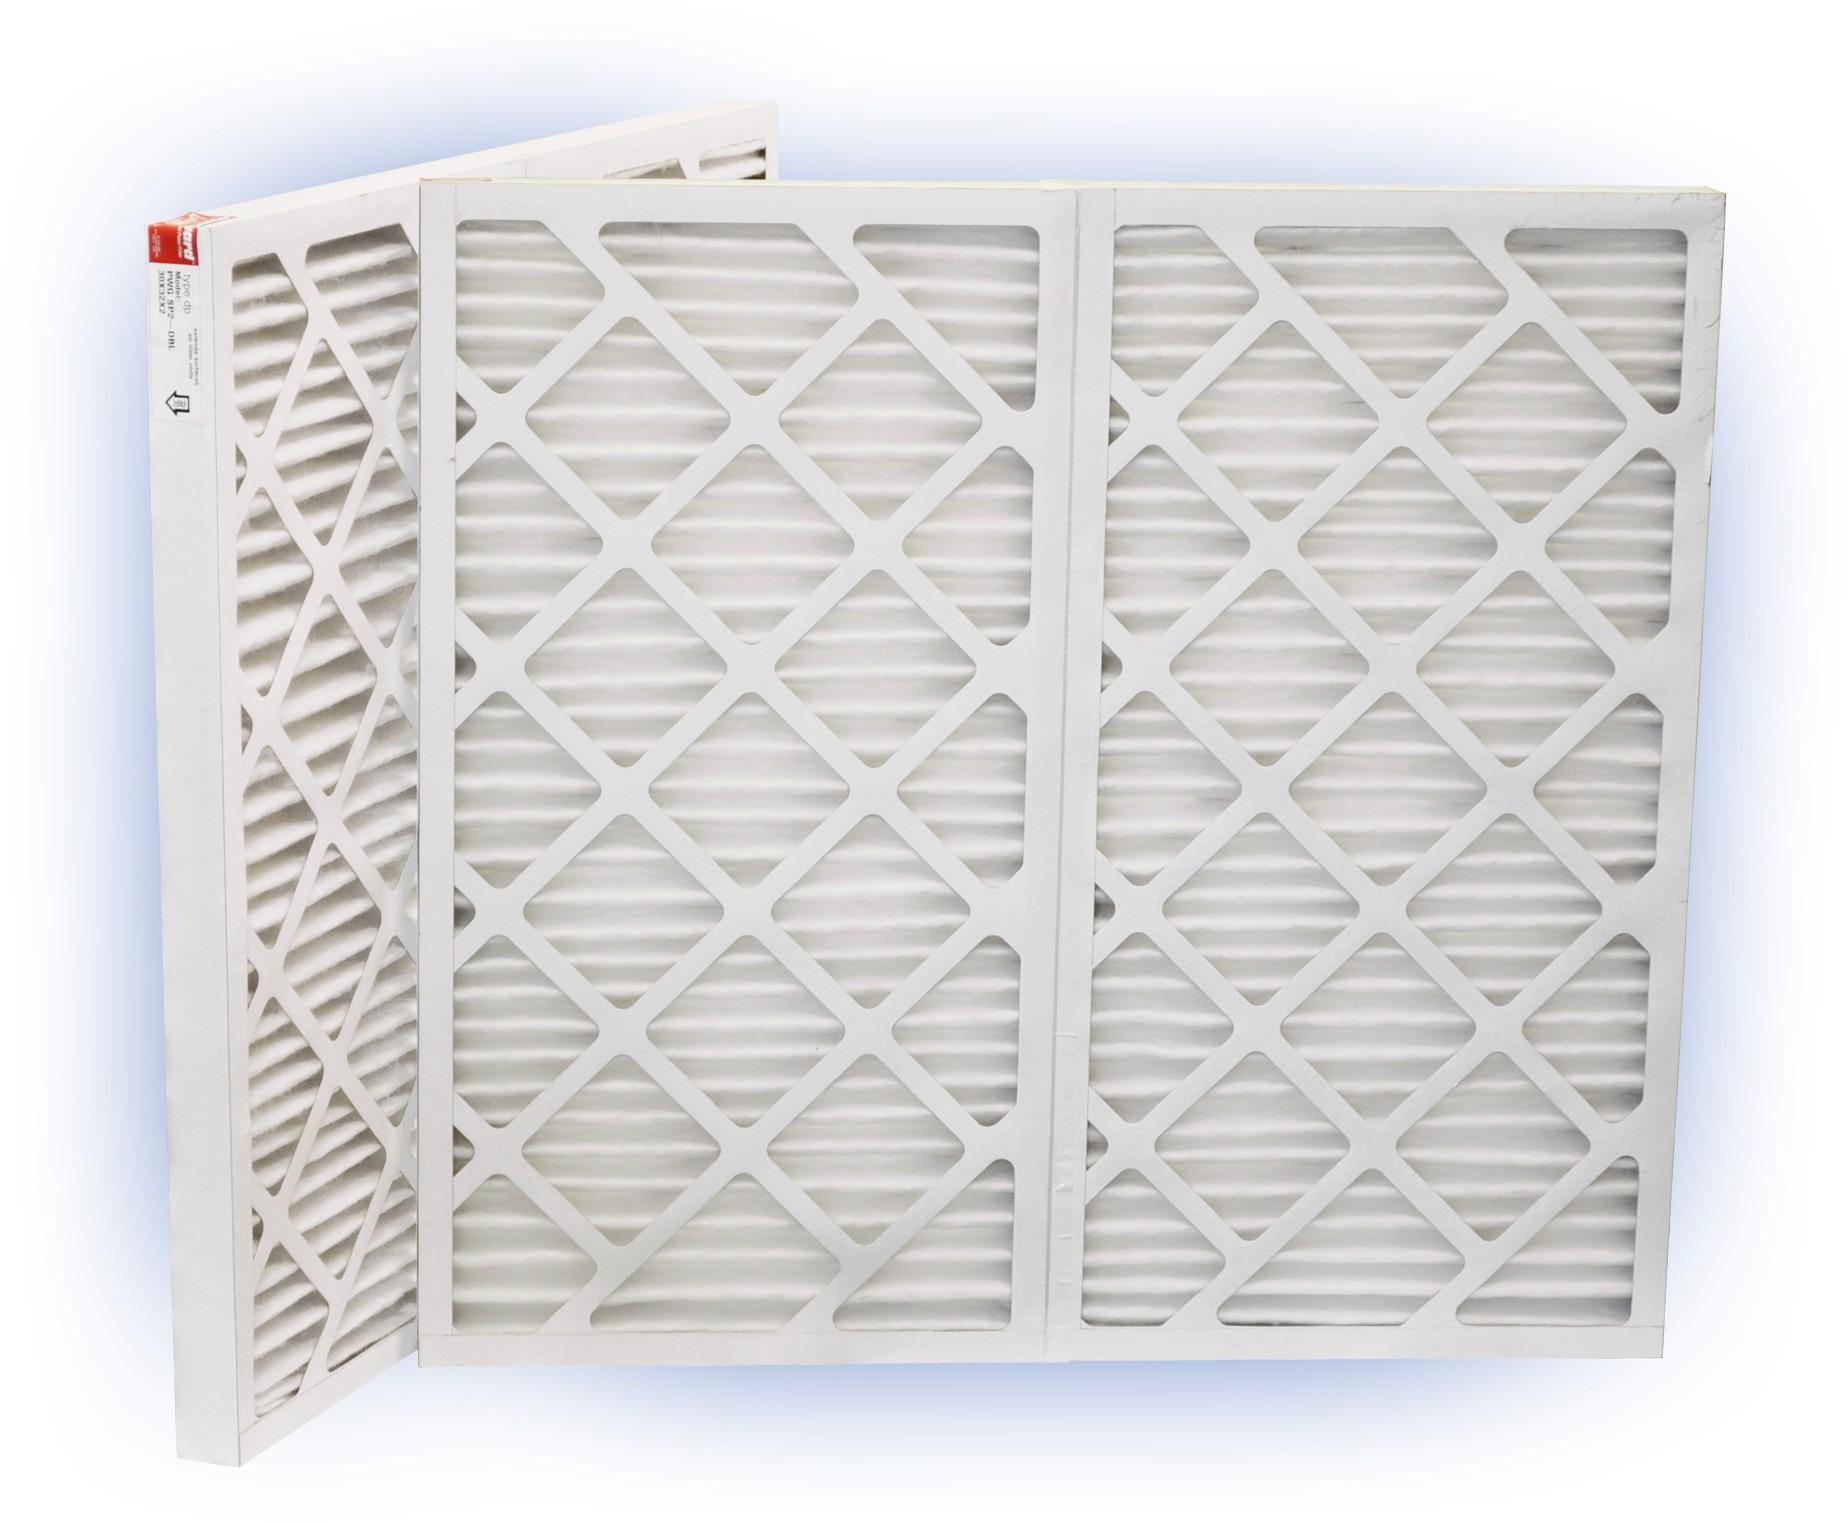 30 x 32 x 2 - PowerGuard Pleated Panel Filter - MERV 11 2-Pack